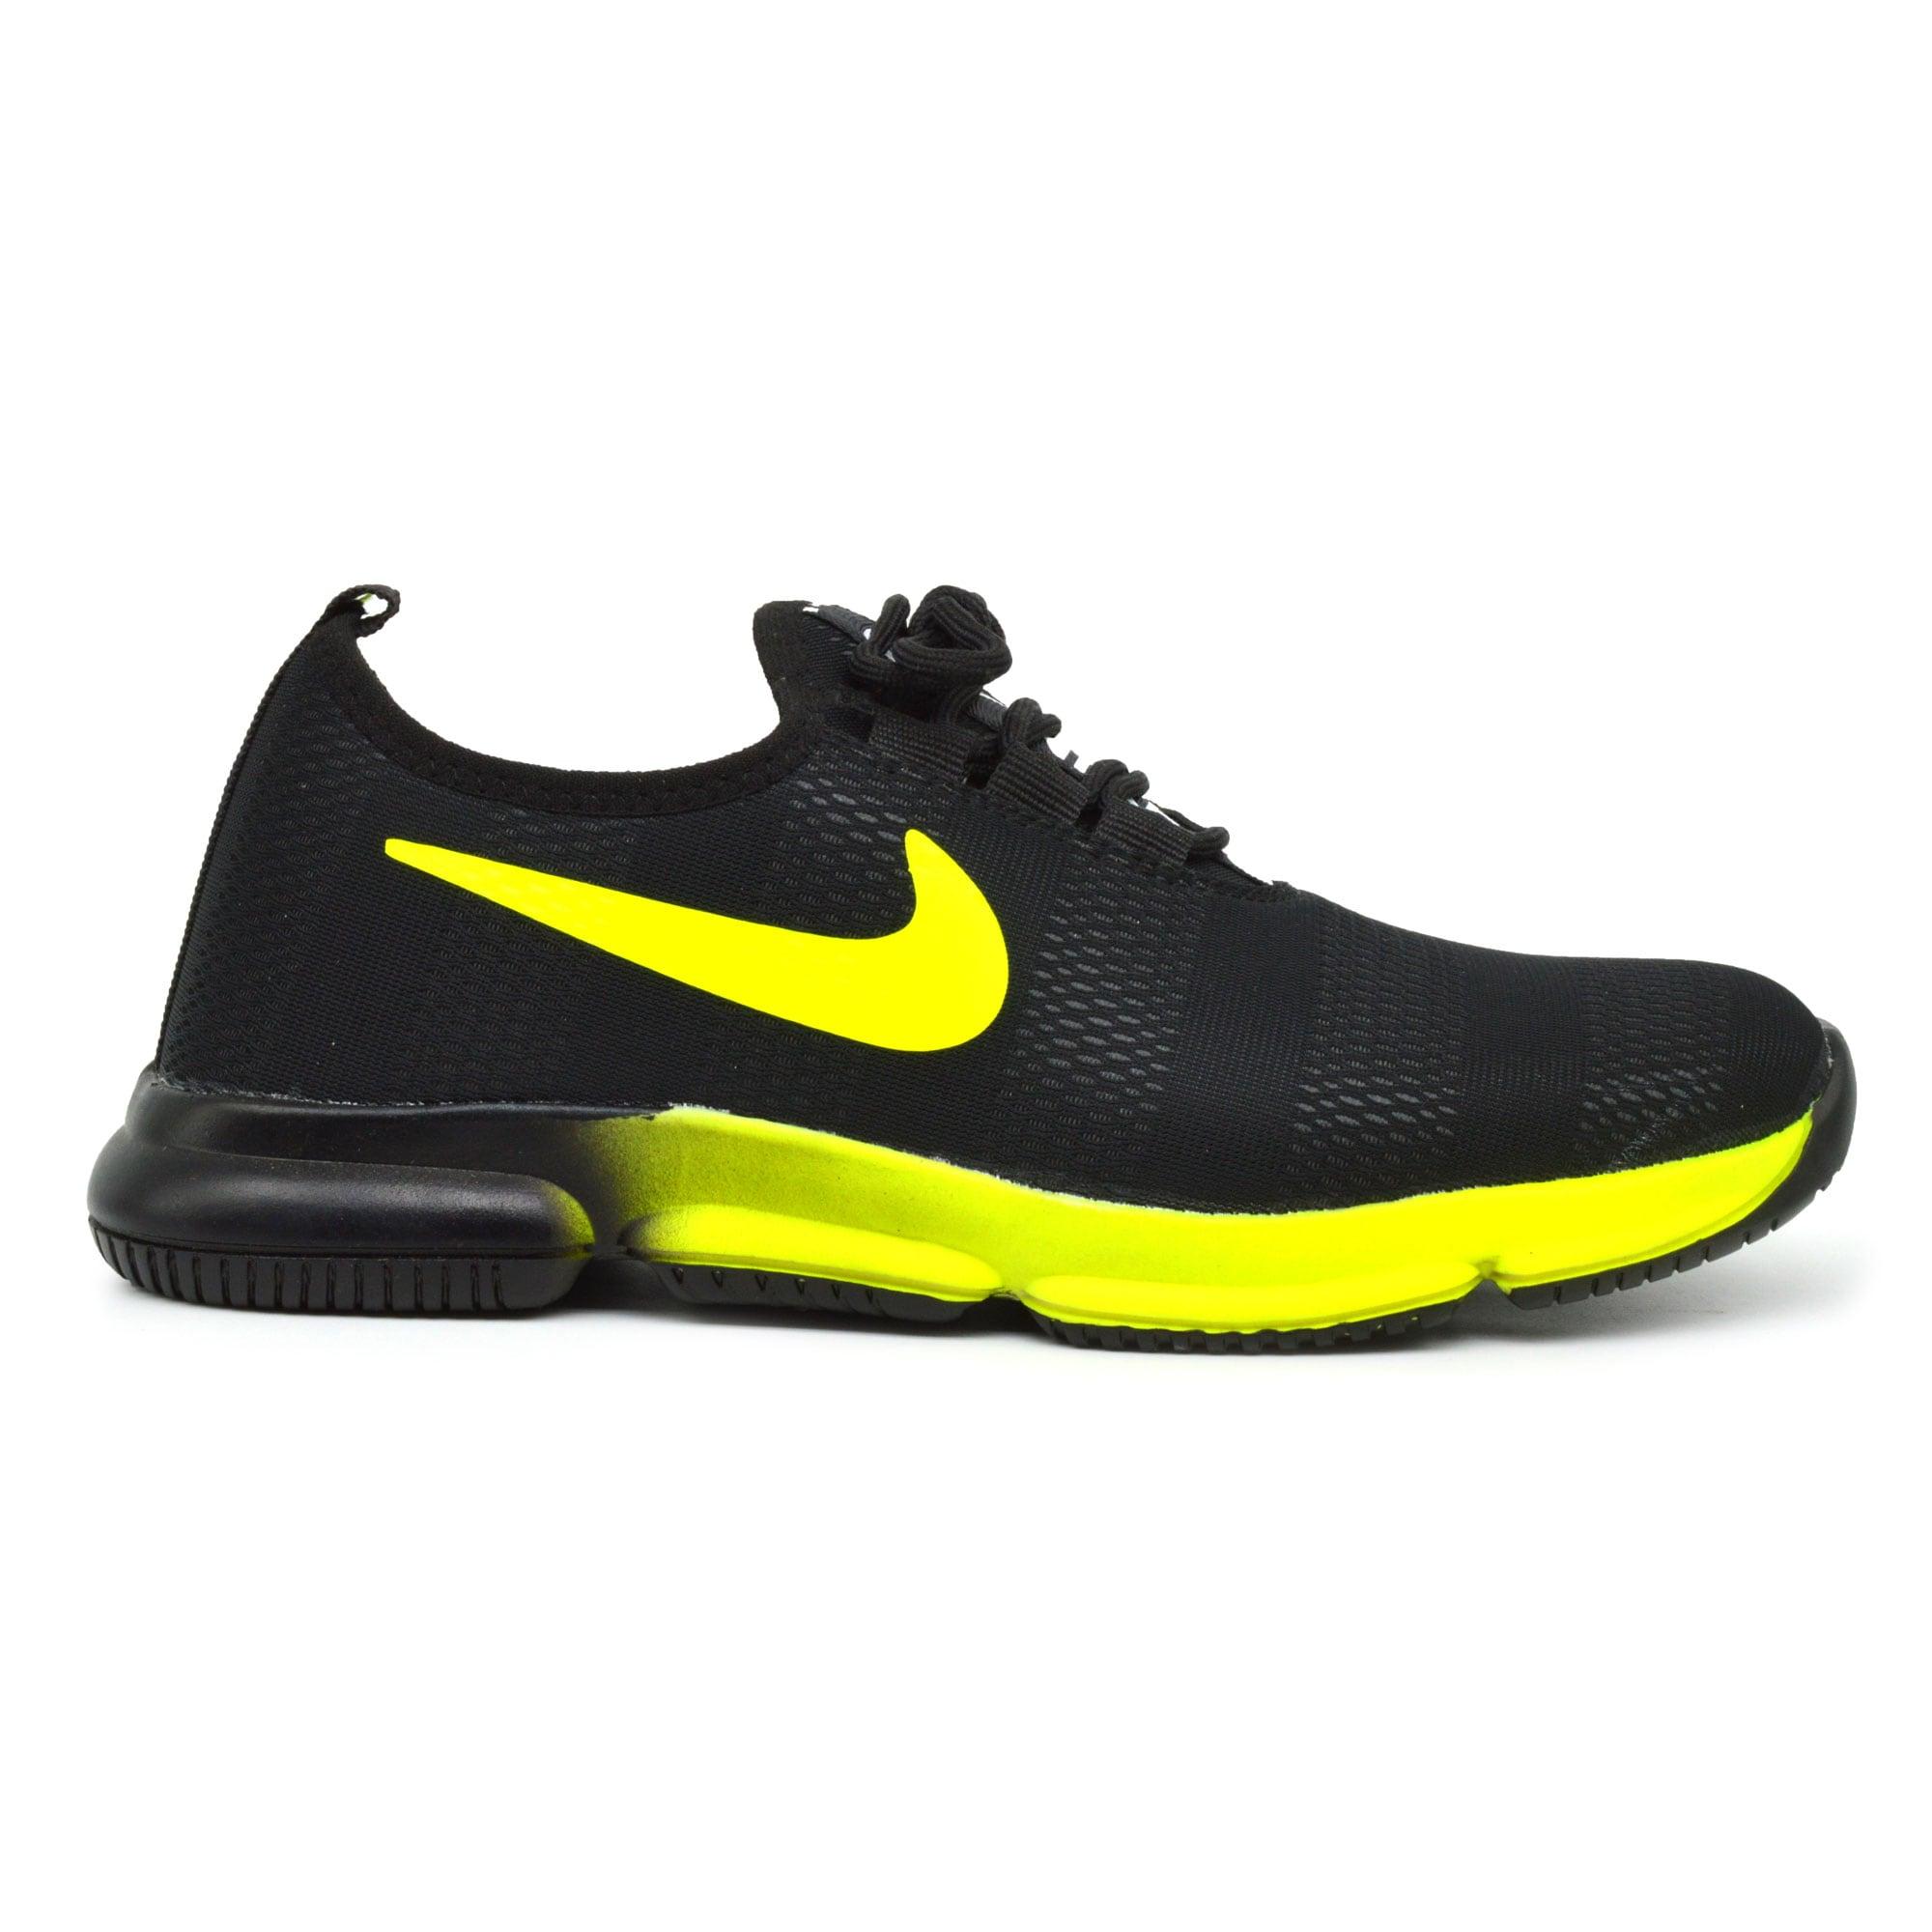 IMCOLUS8.171_BLACK  OUTDOOR WEAR & FLEXIBLE MENS Sports Shoes SHOES  IMCOLUS8.171_BLACK (BLACK,6TO10,8 PAIR)